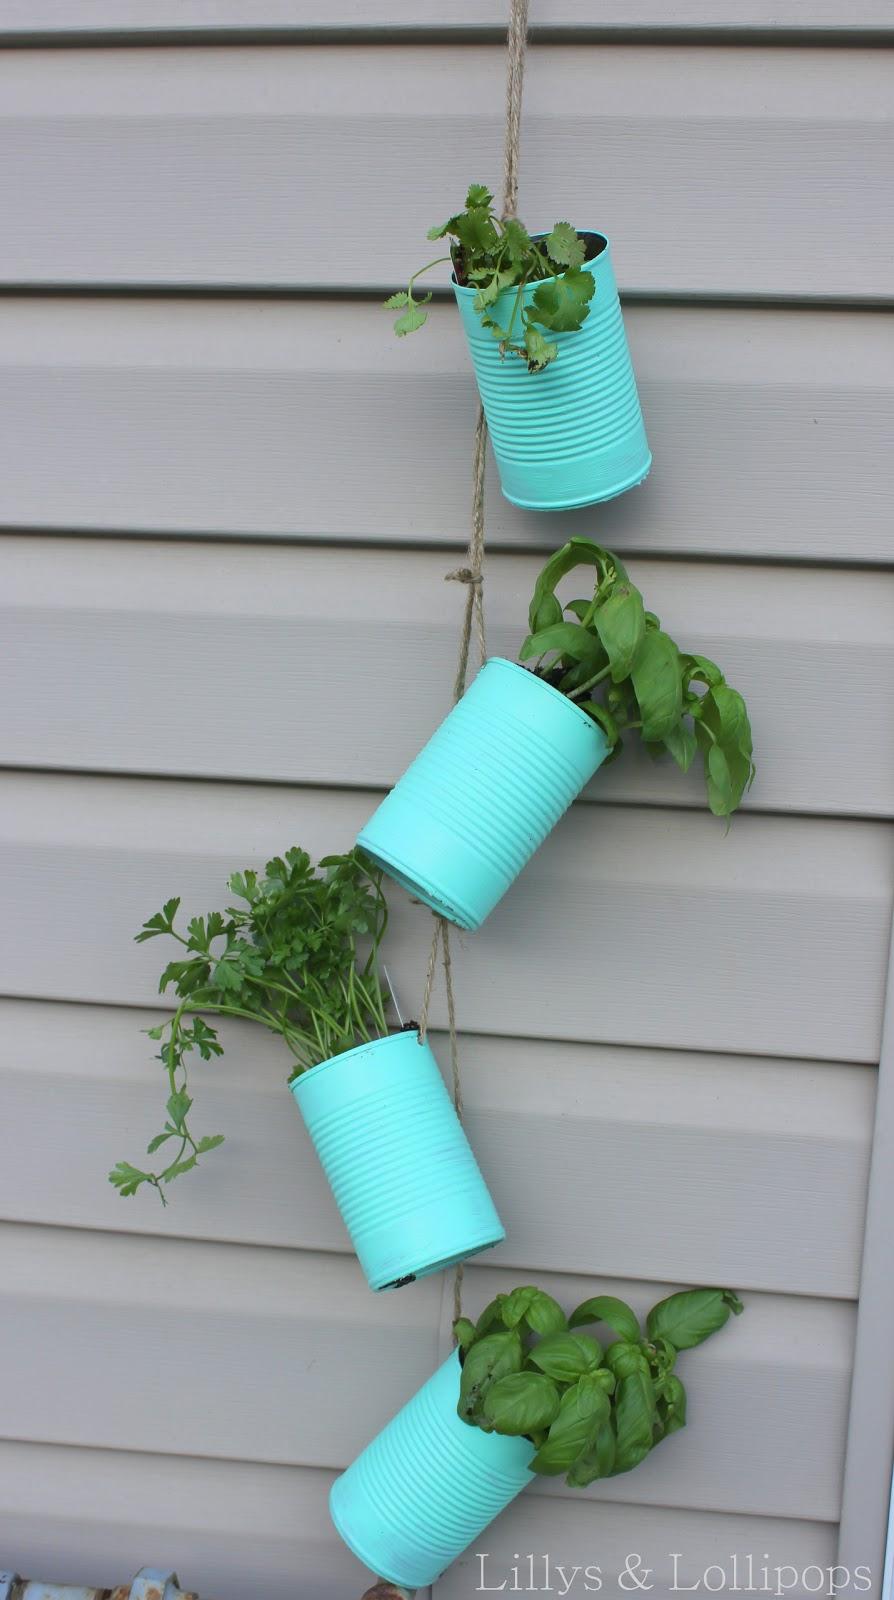 Lillys & Lollipops: Hanging Tin Can Herb Garden